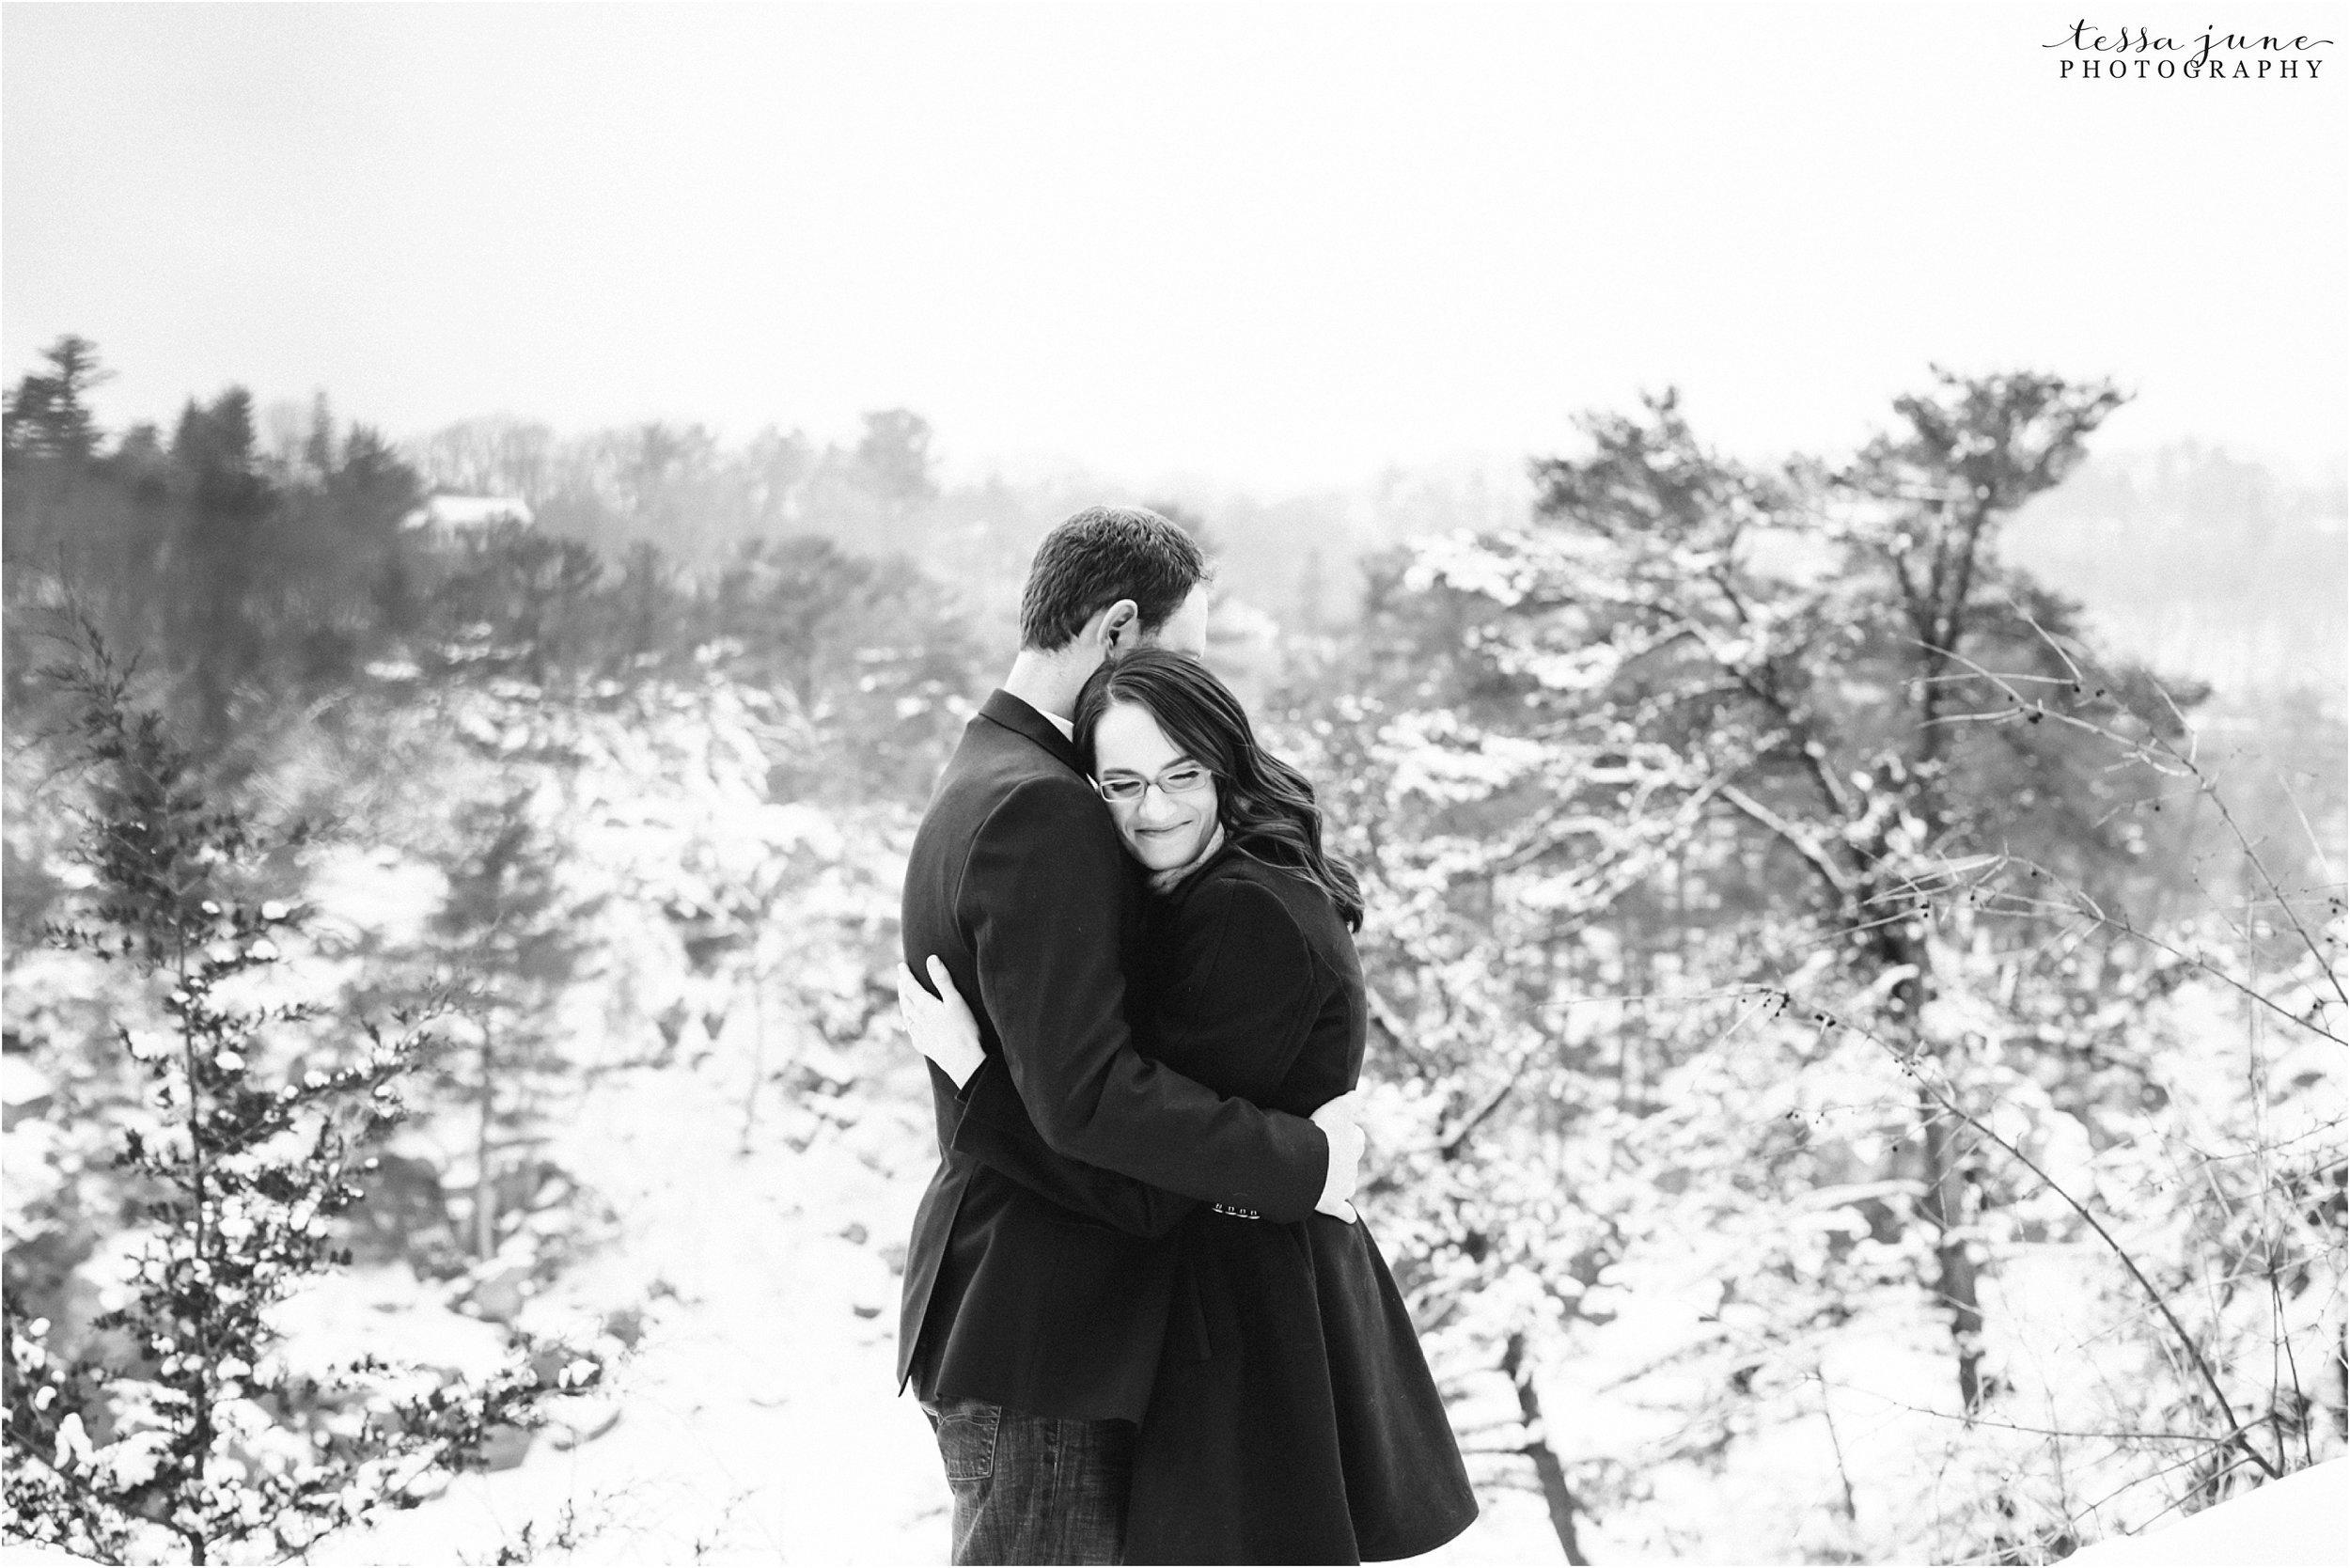 taylors-falls-winter-engagement-session-st-cloud-photographer-22.jpg